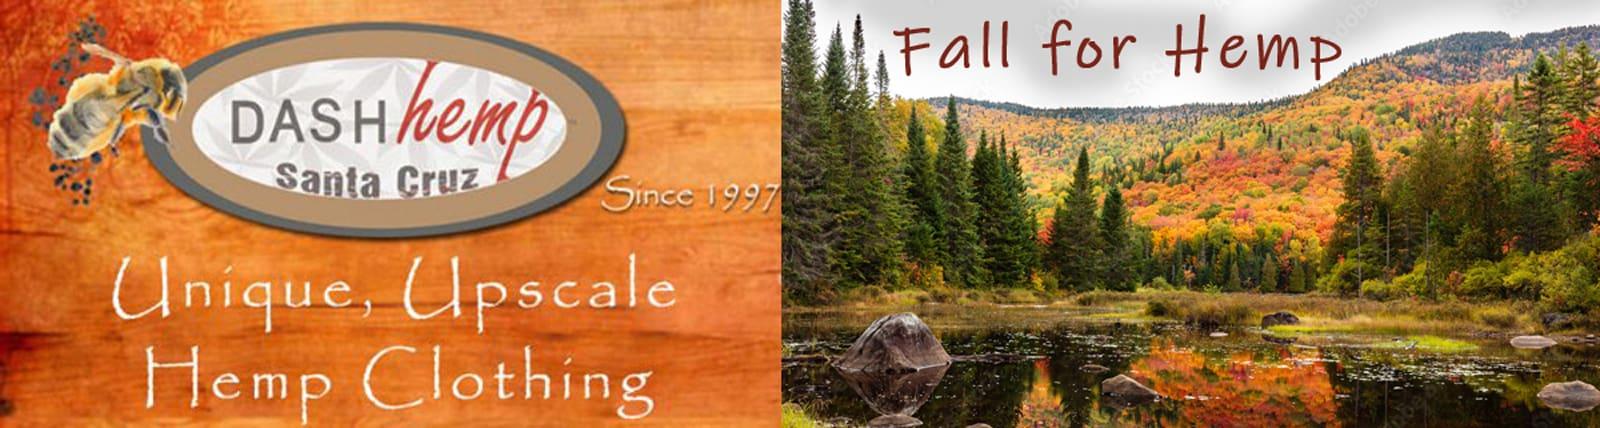 Fall for Hemp Clothing